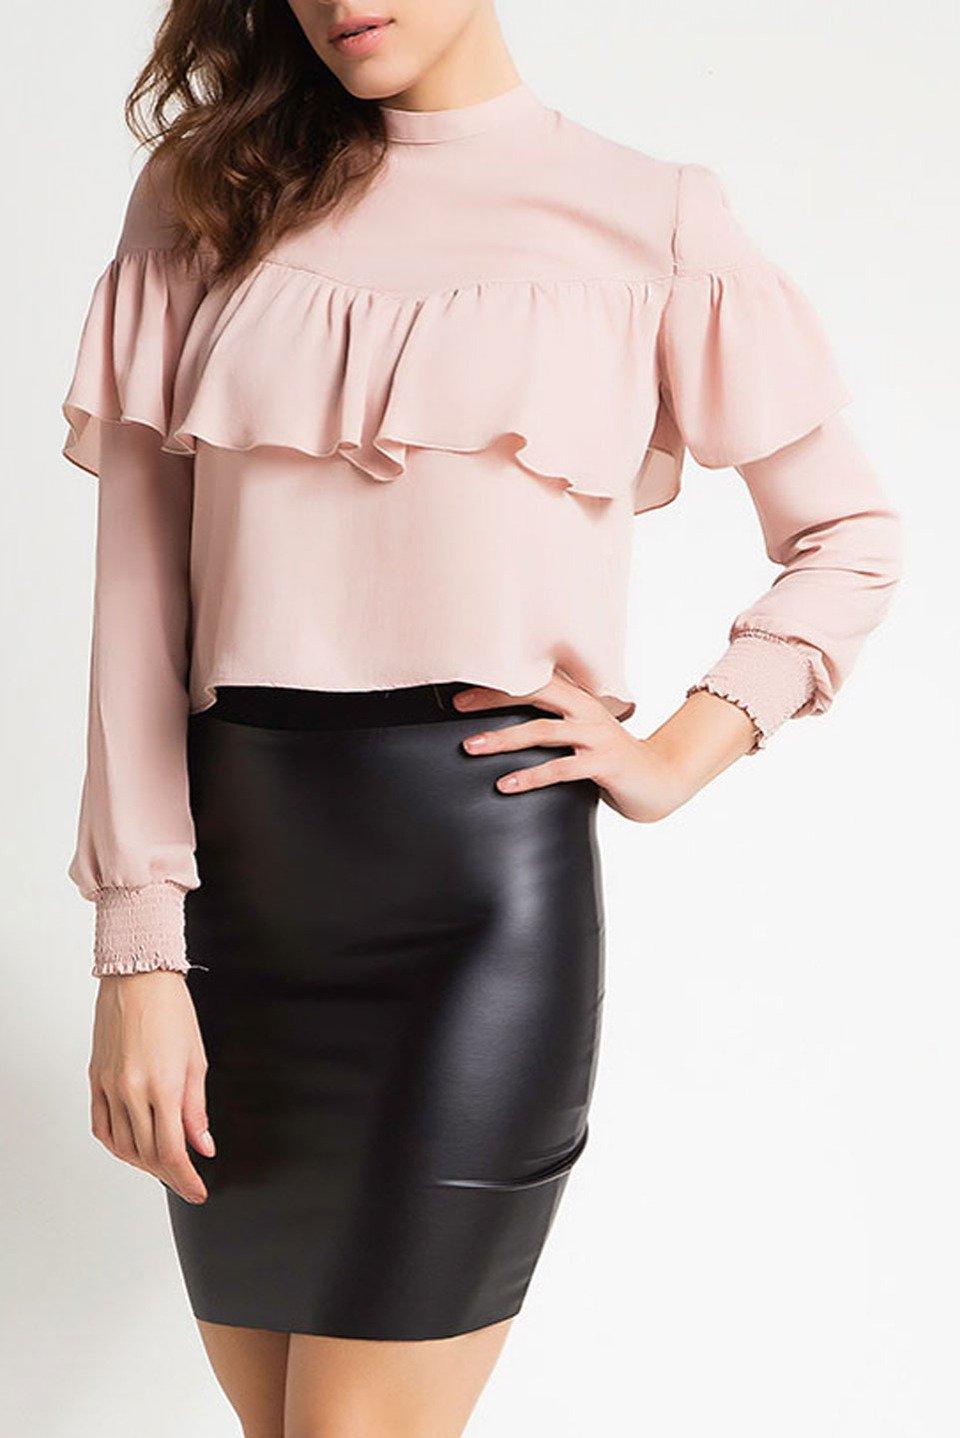 Peony Skirt in Black